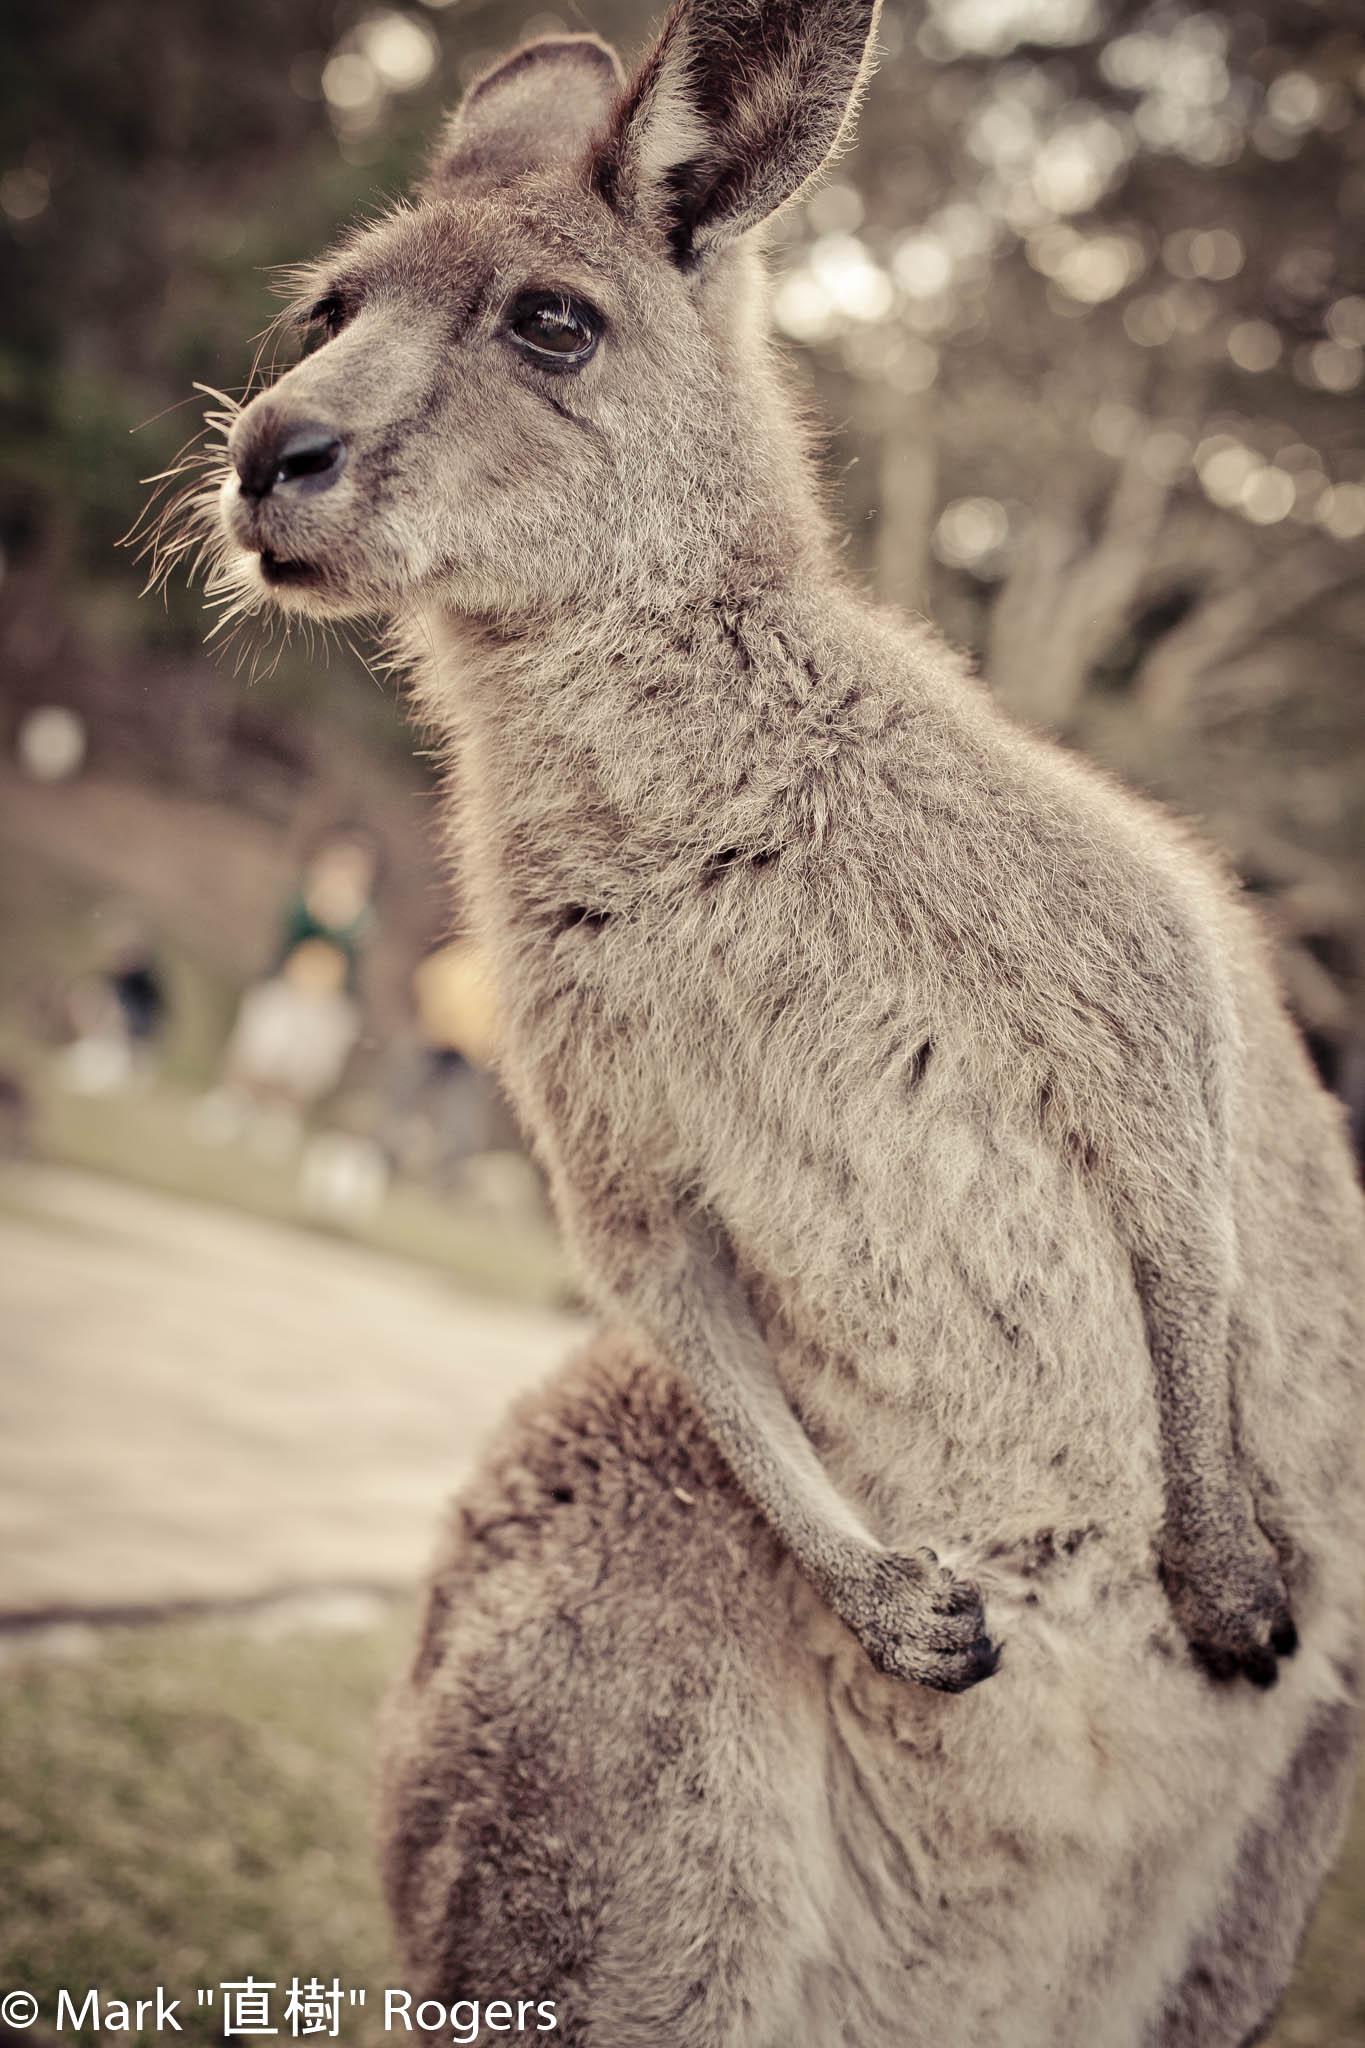 Kangaroo_MarkR